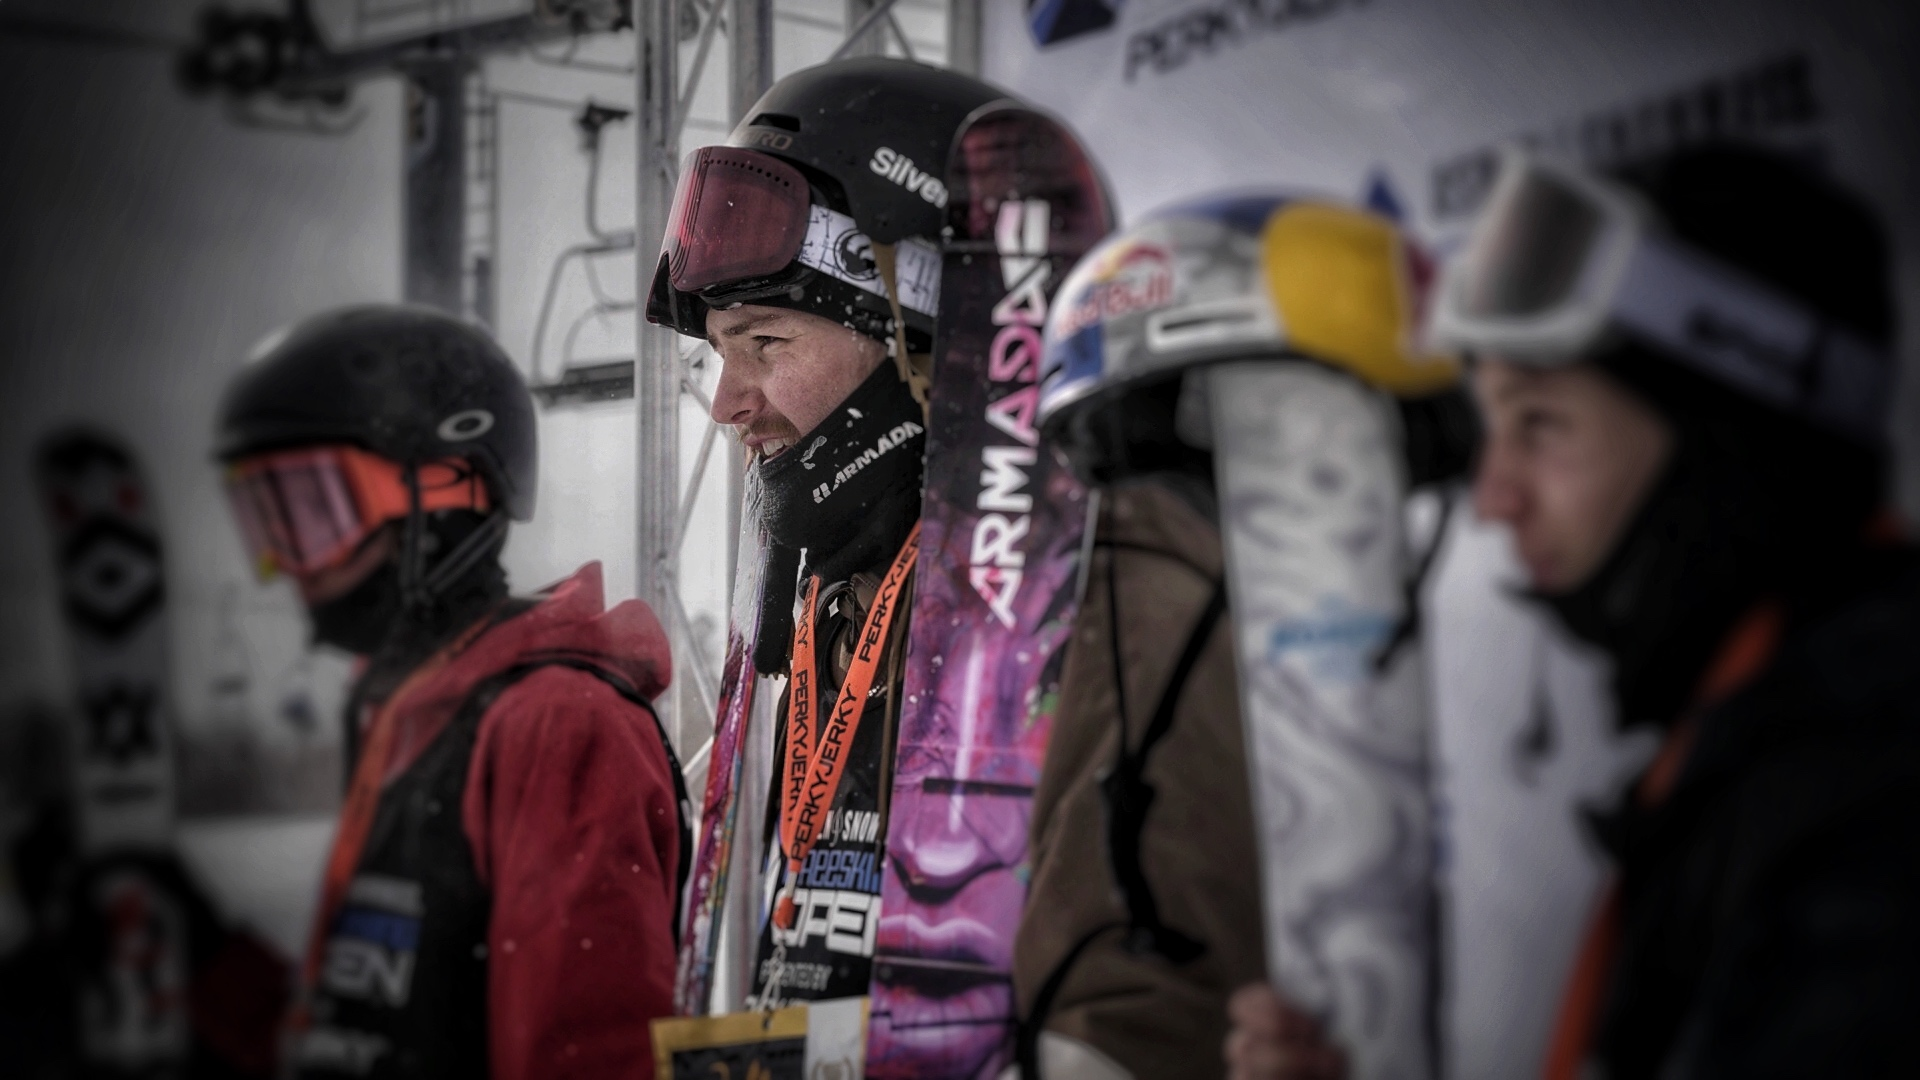 Aspen open podium pic 3.JPG